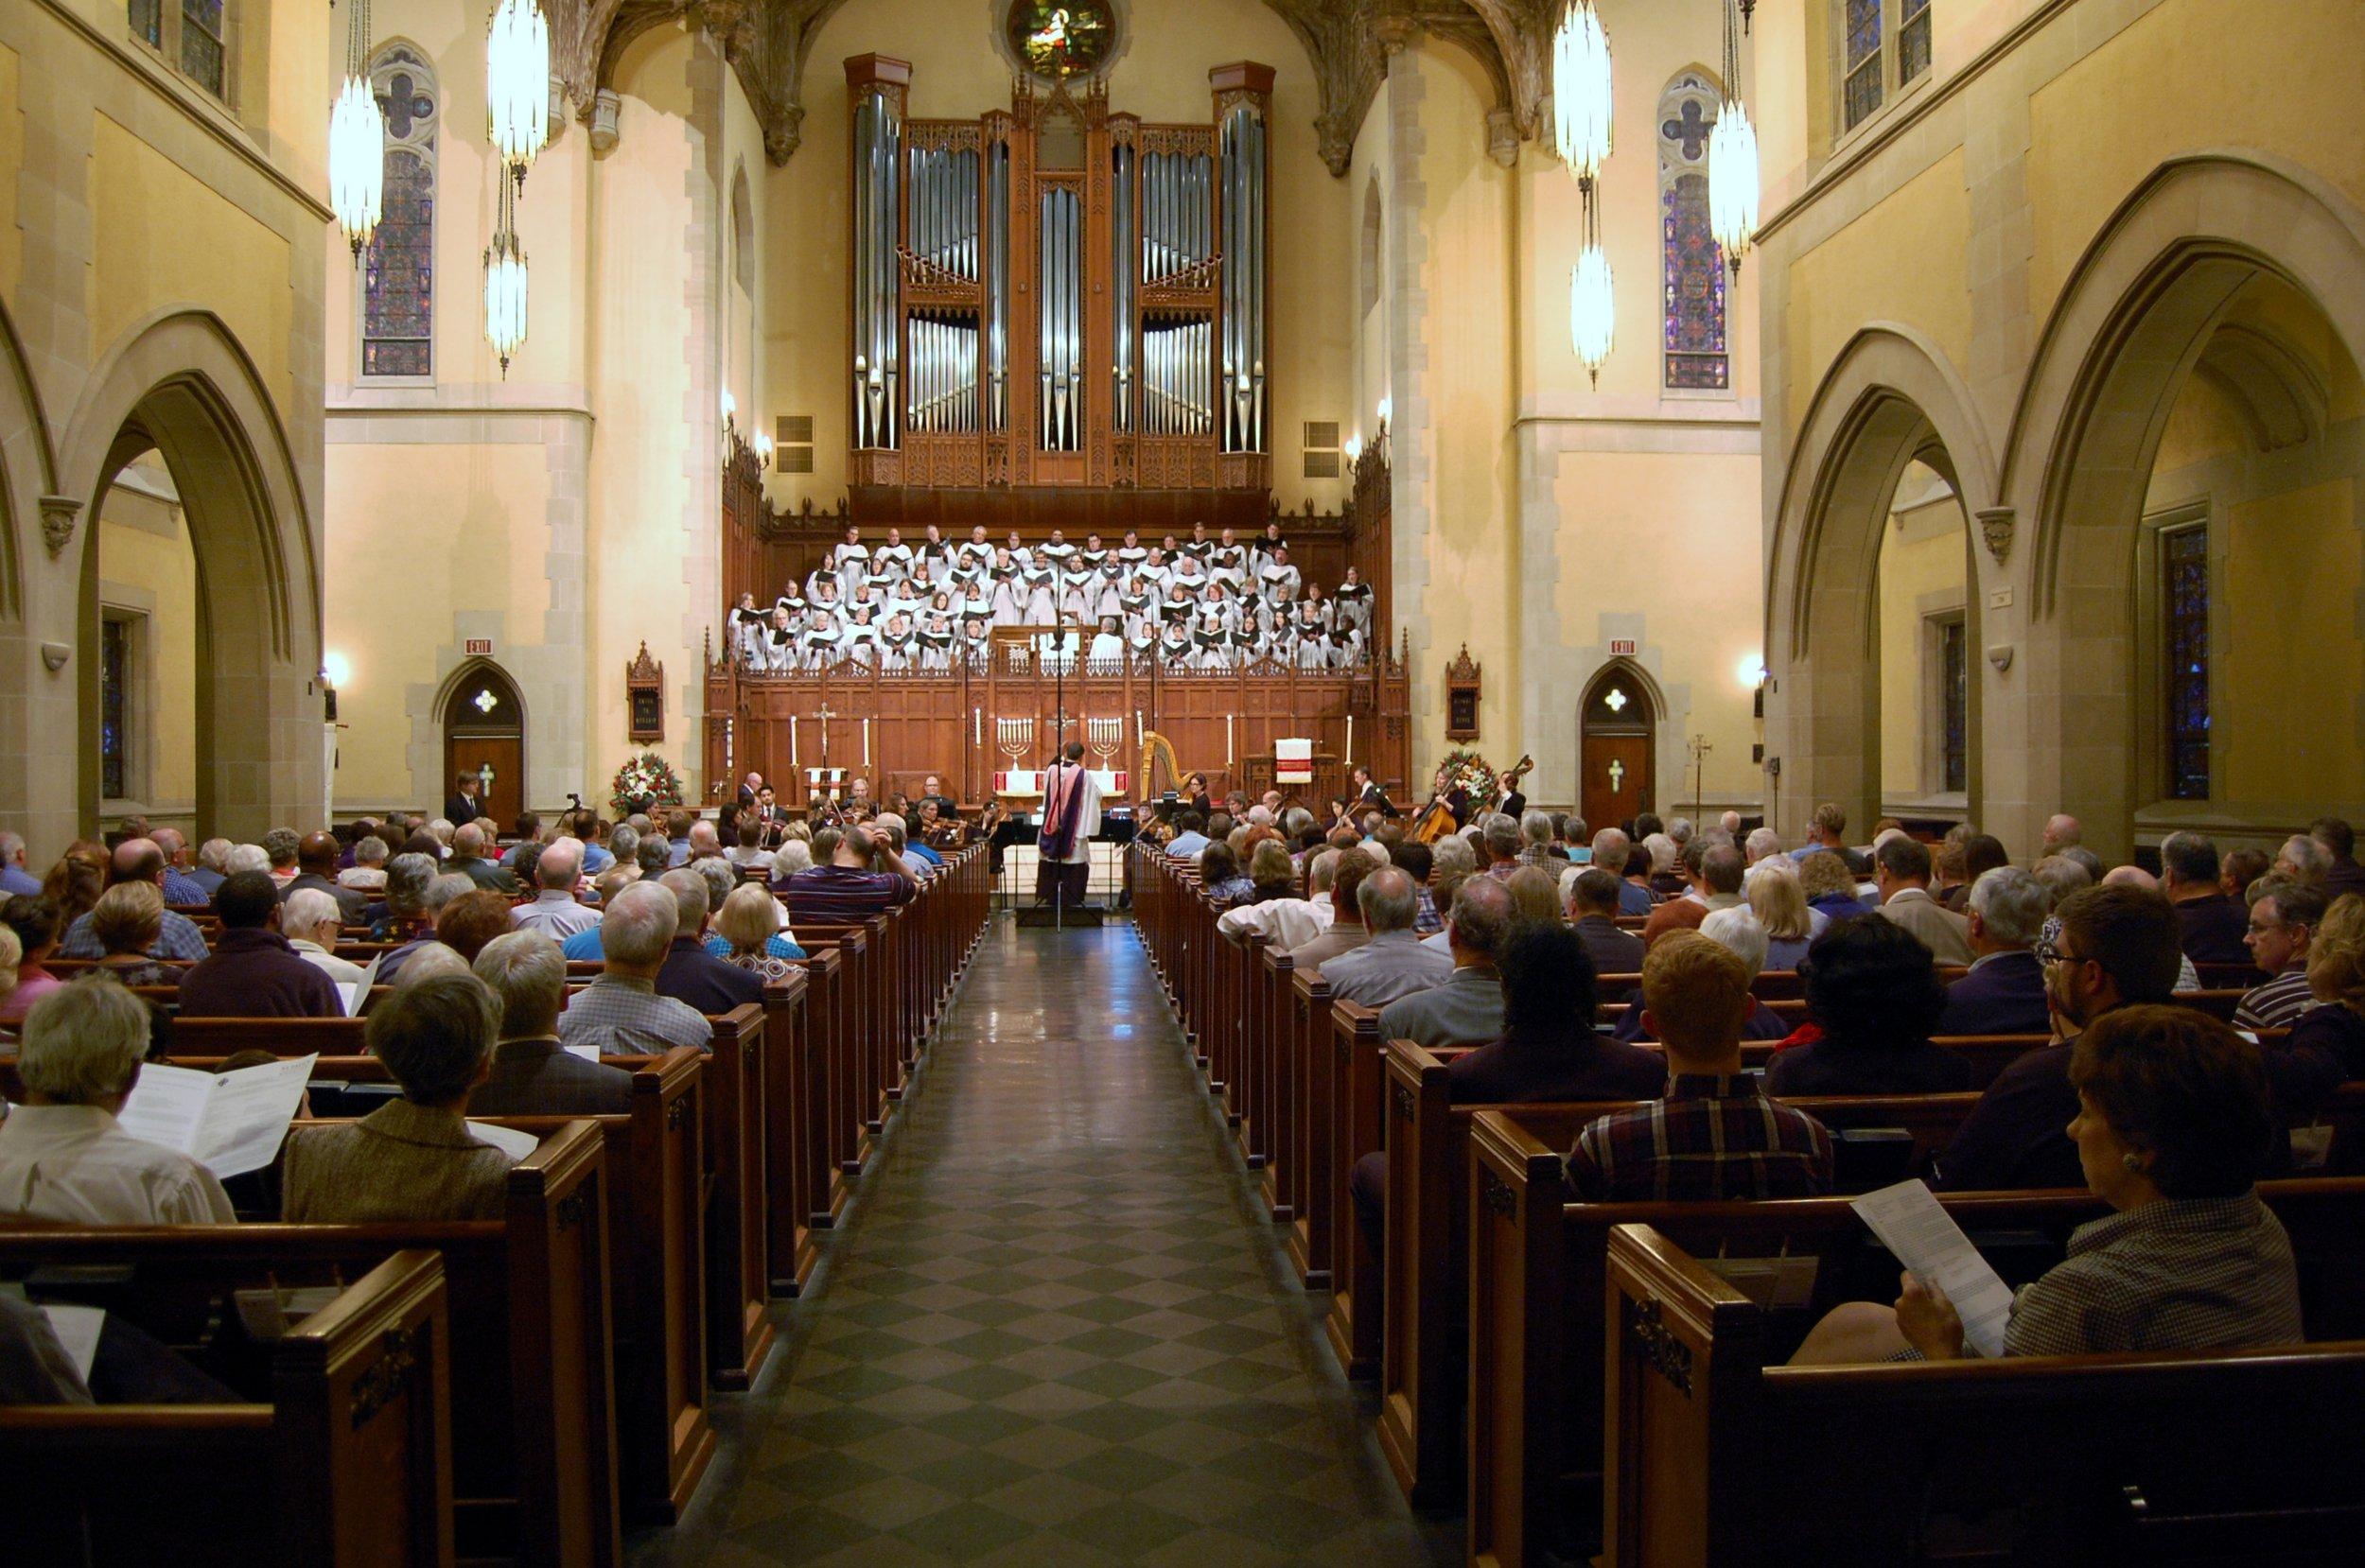 Fauré Requiem,St. Paul's U.M. Church, Houston